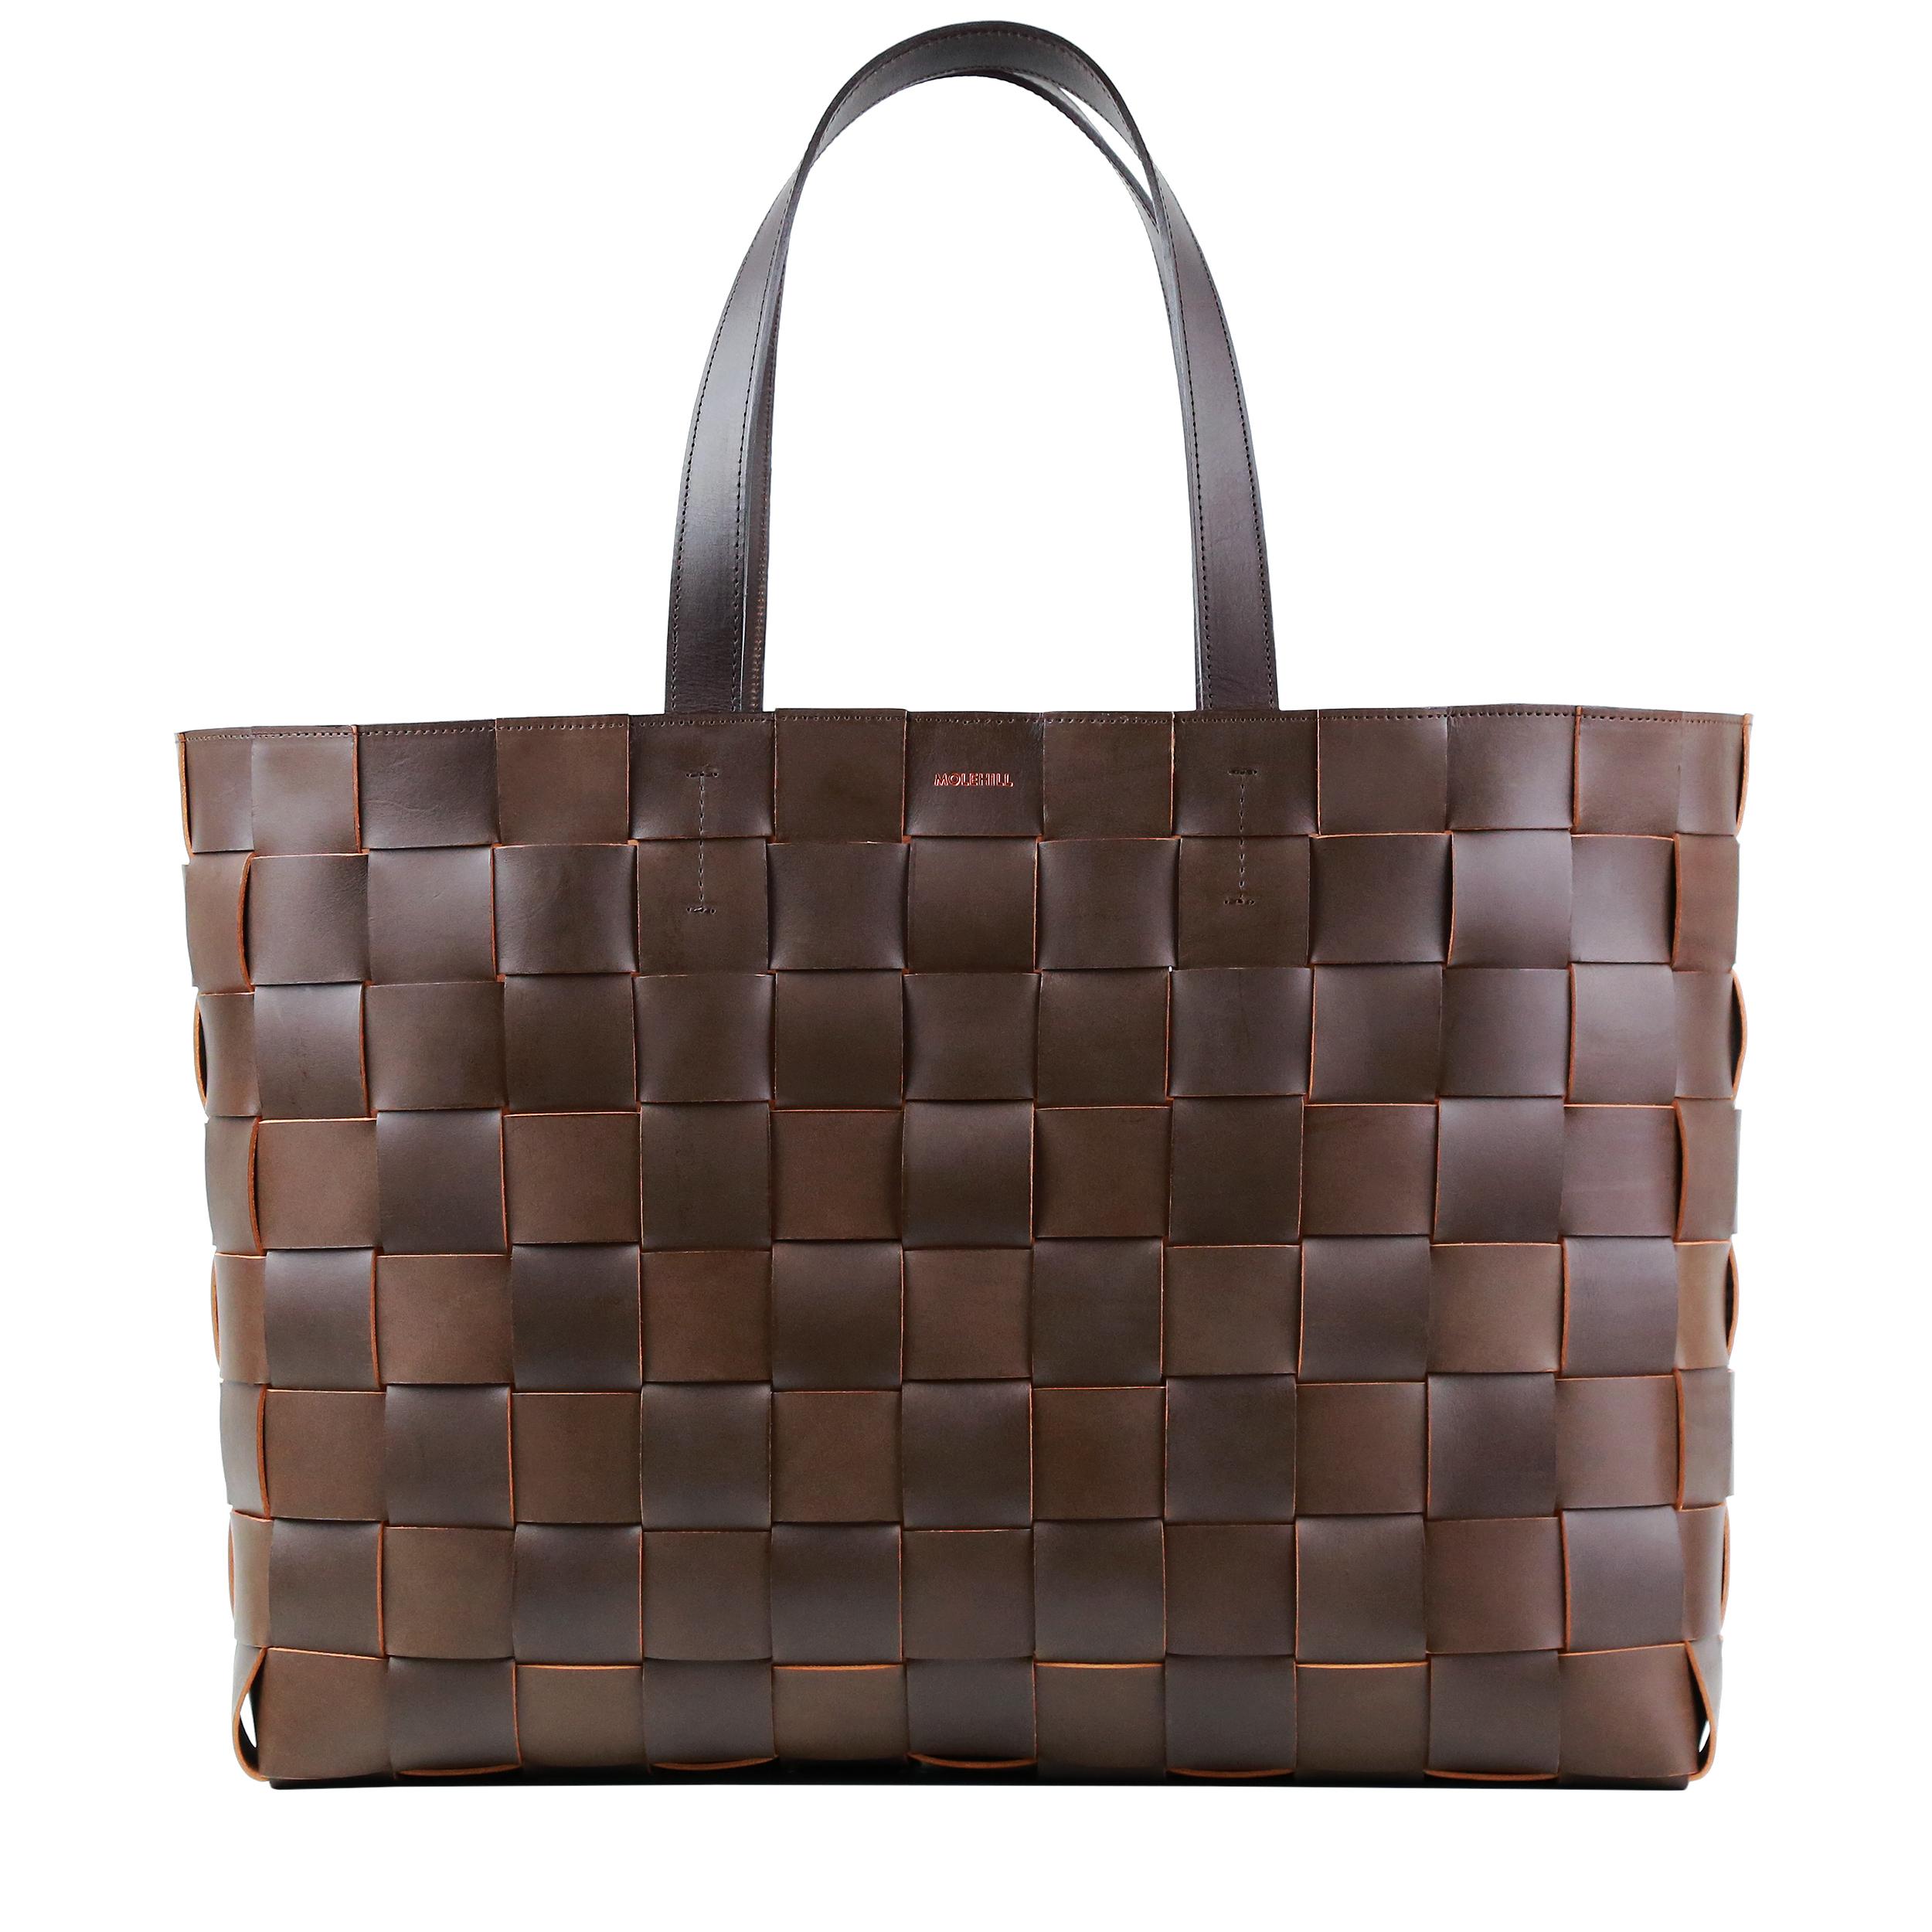 Pane Weekender Woven Bag-Light-Chocolate-1